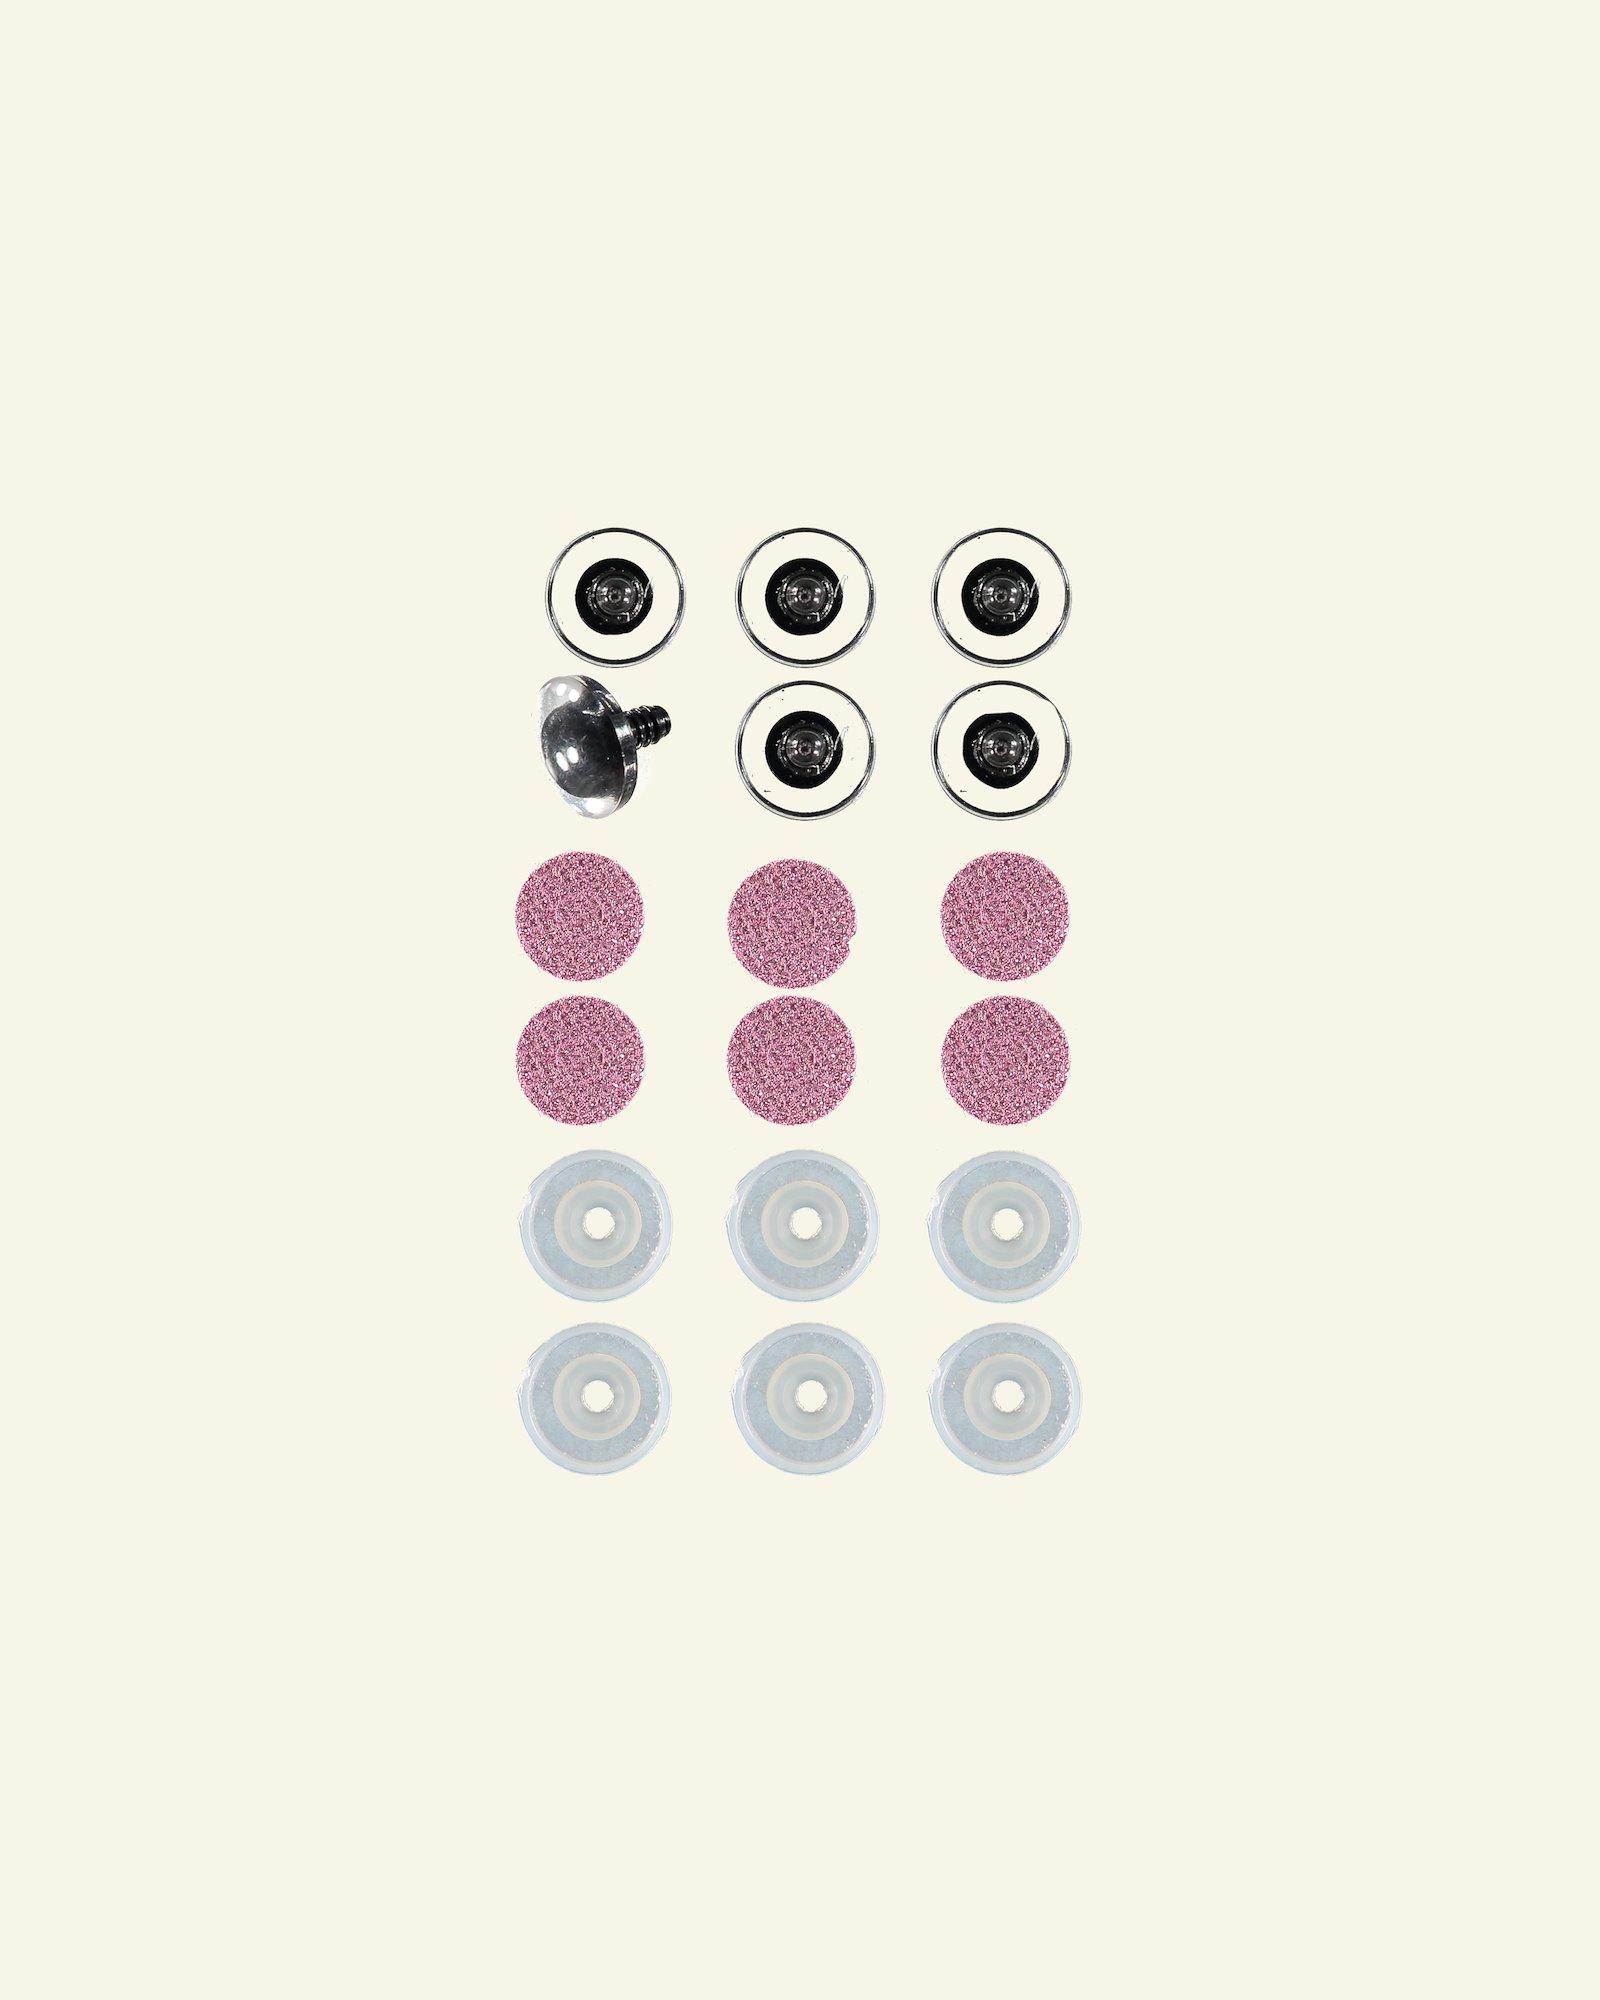 Glitzernde augen 16mm rosa 6 pcs